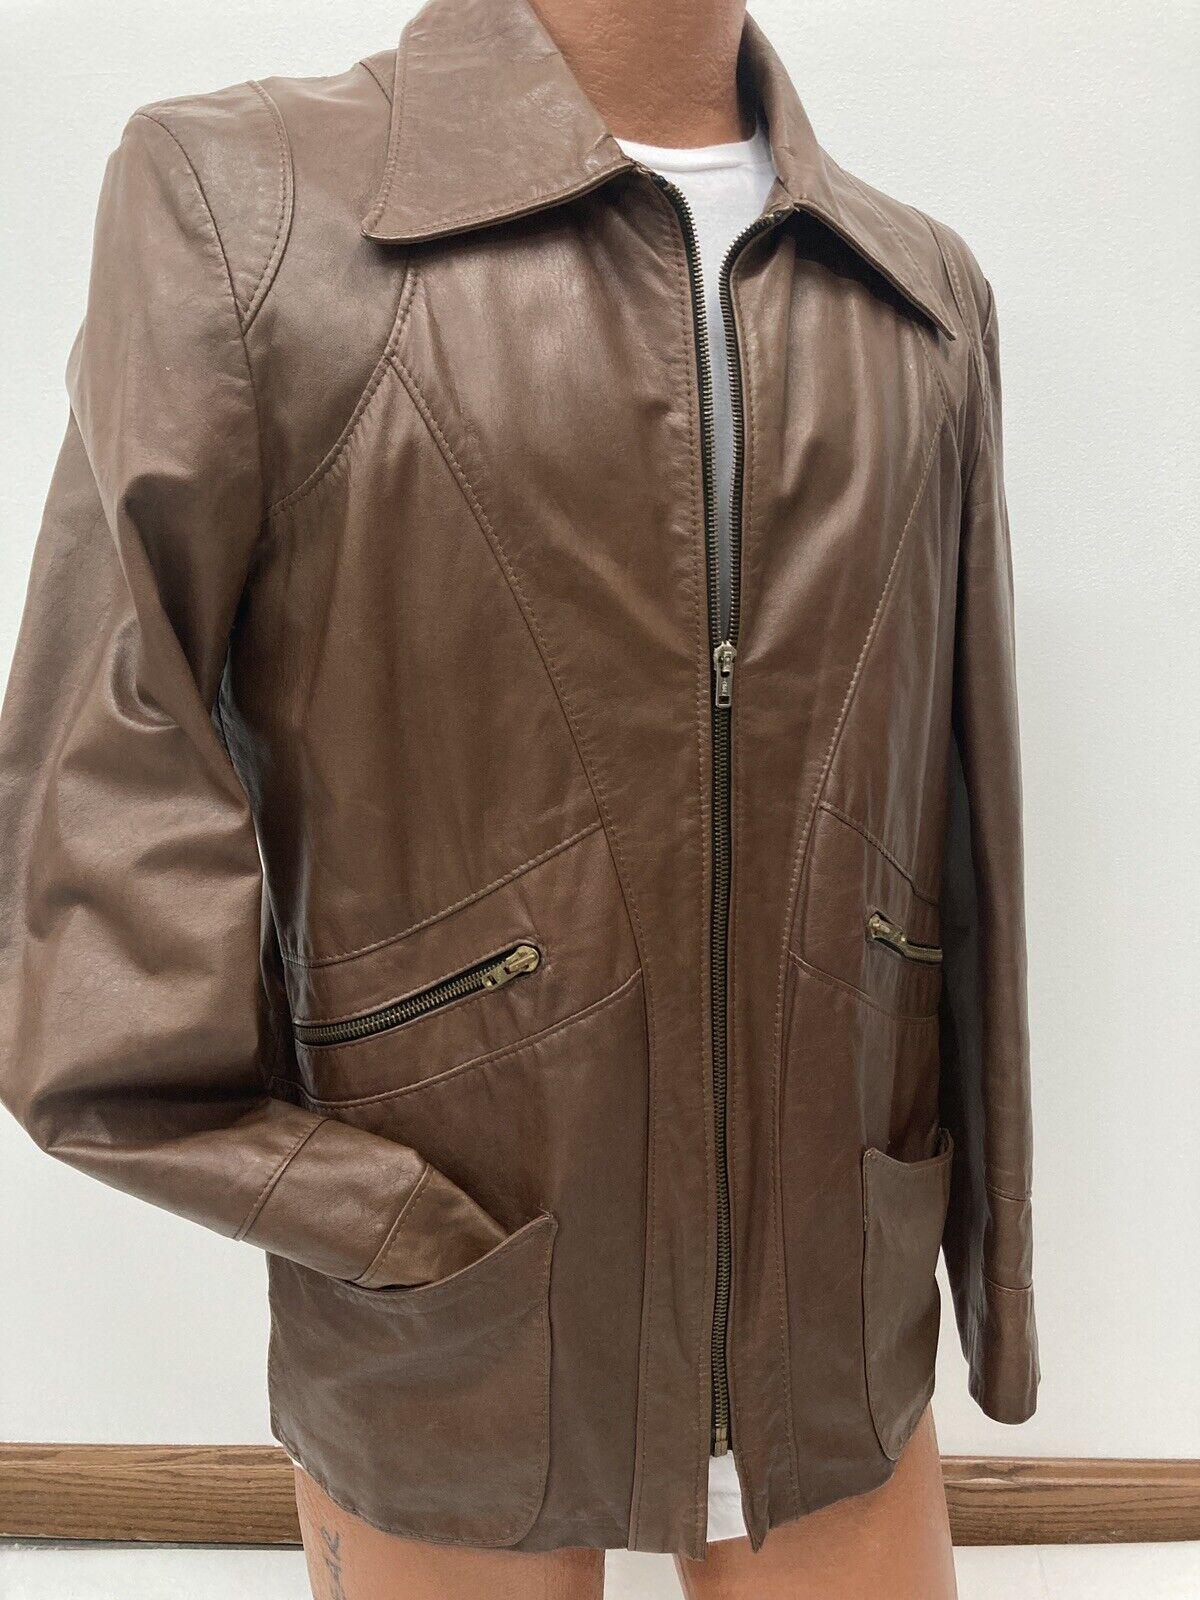 Genuine Vintage 1970s Brown Leather Blazer Jacket… - image 7